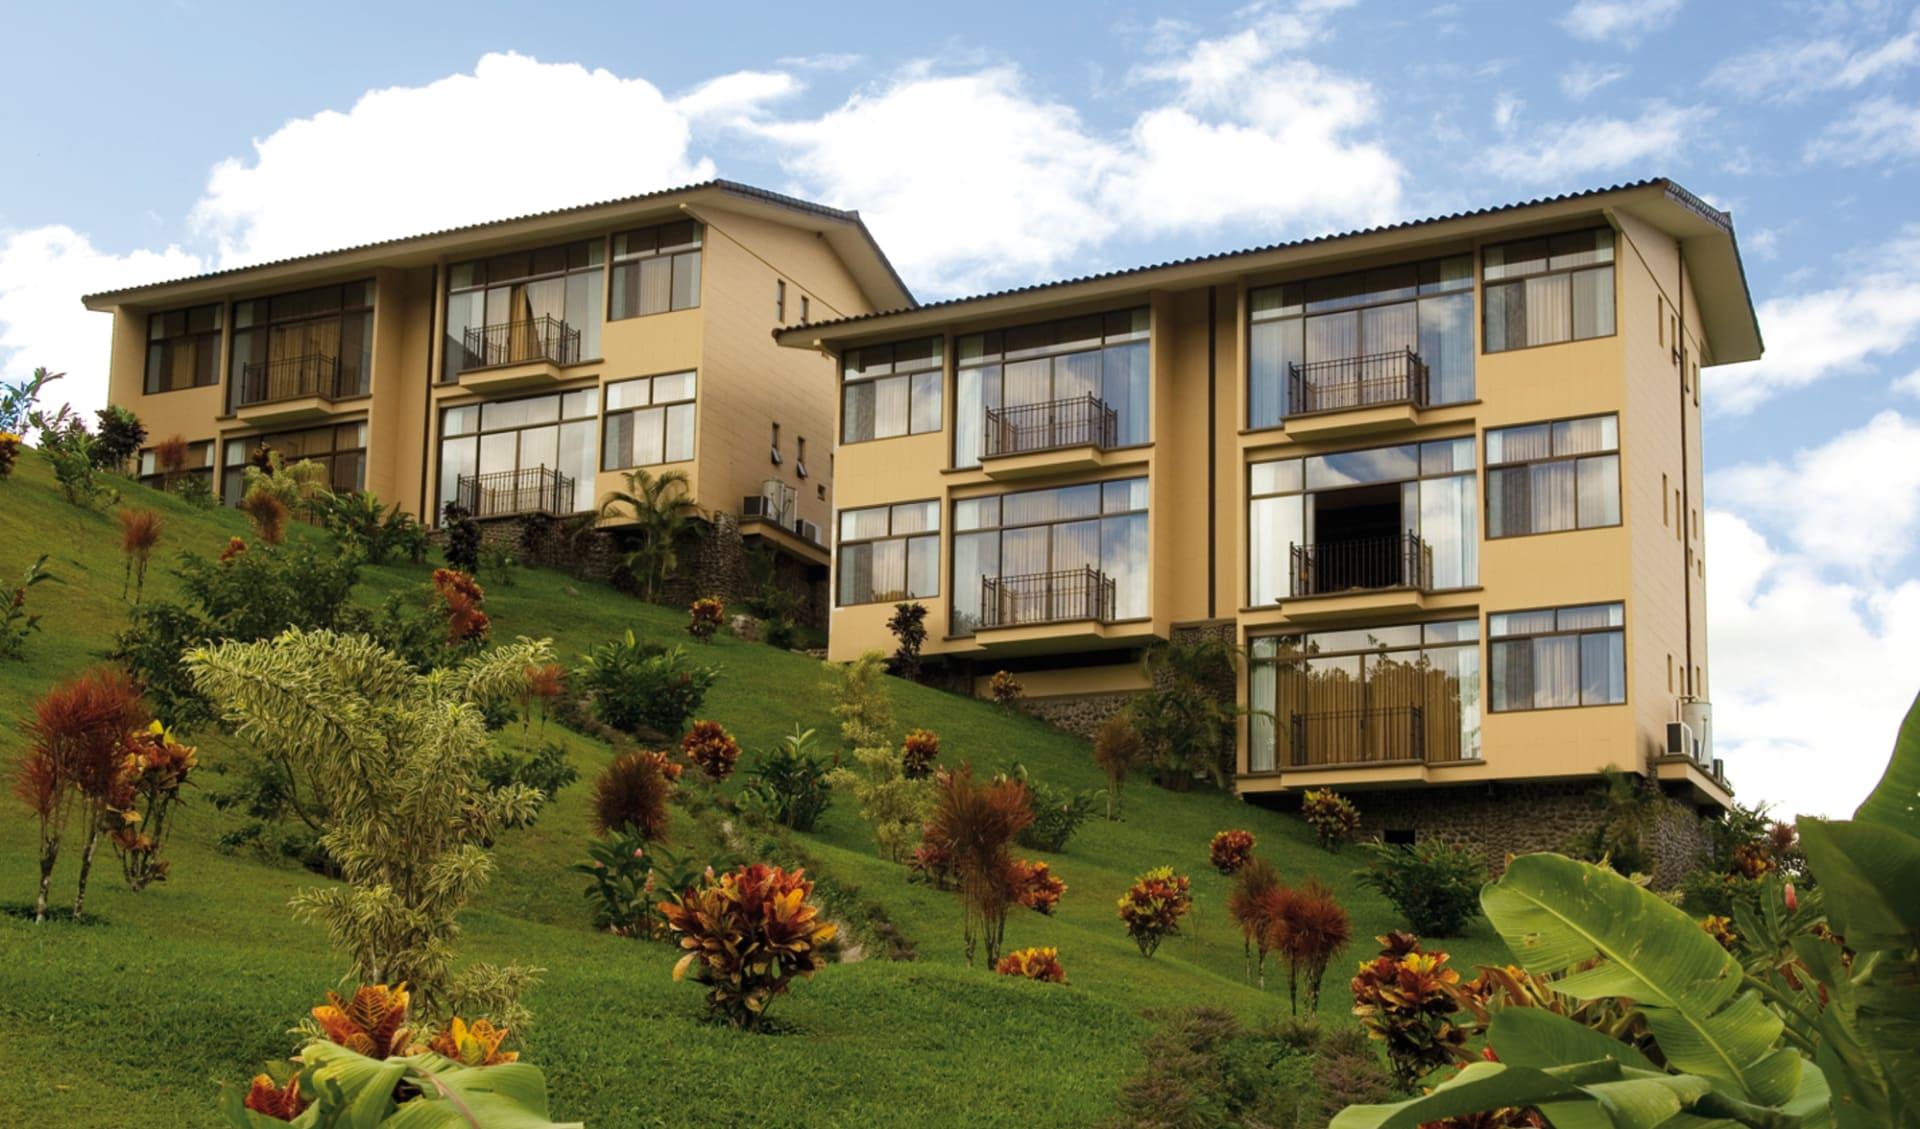 Arenal Kioro Suites & Spa in La Fortuna: exterior arenal kioro gebäude wiese